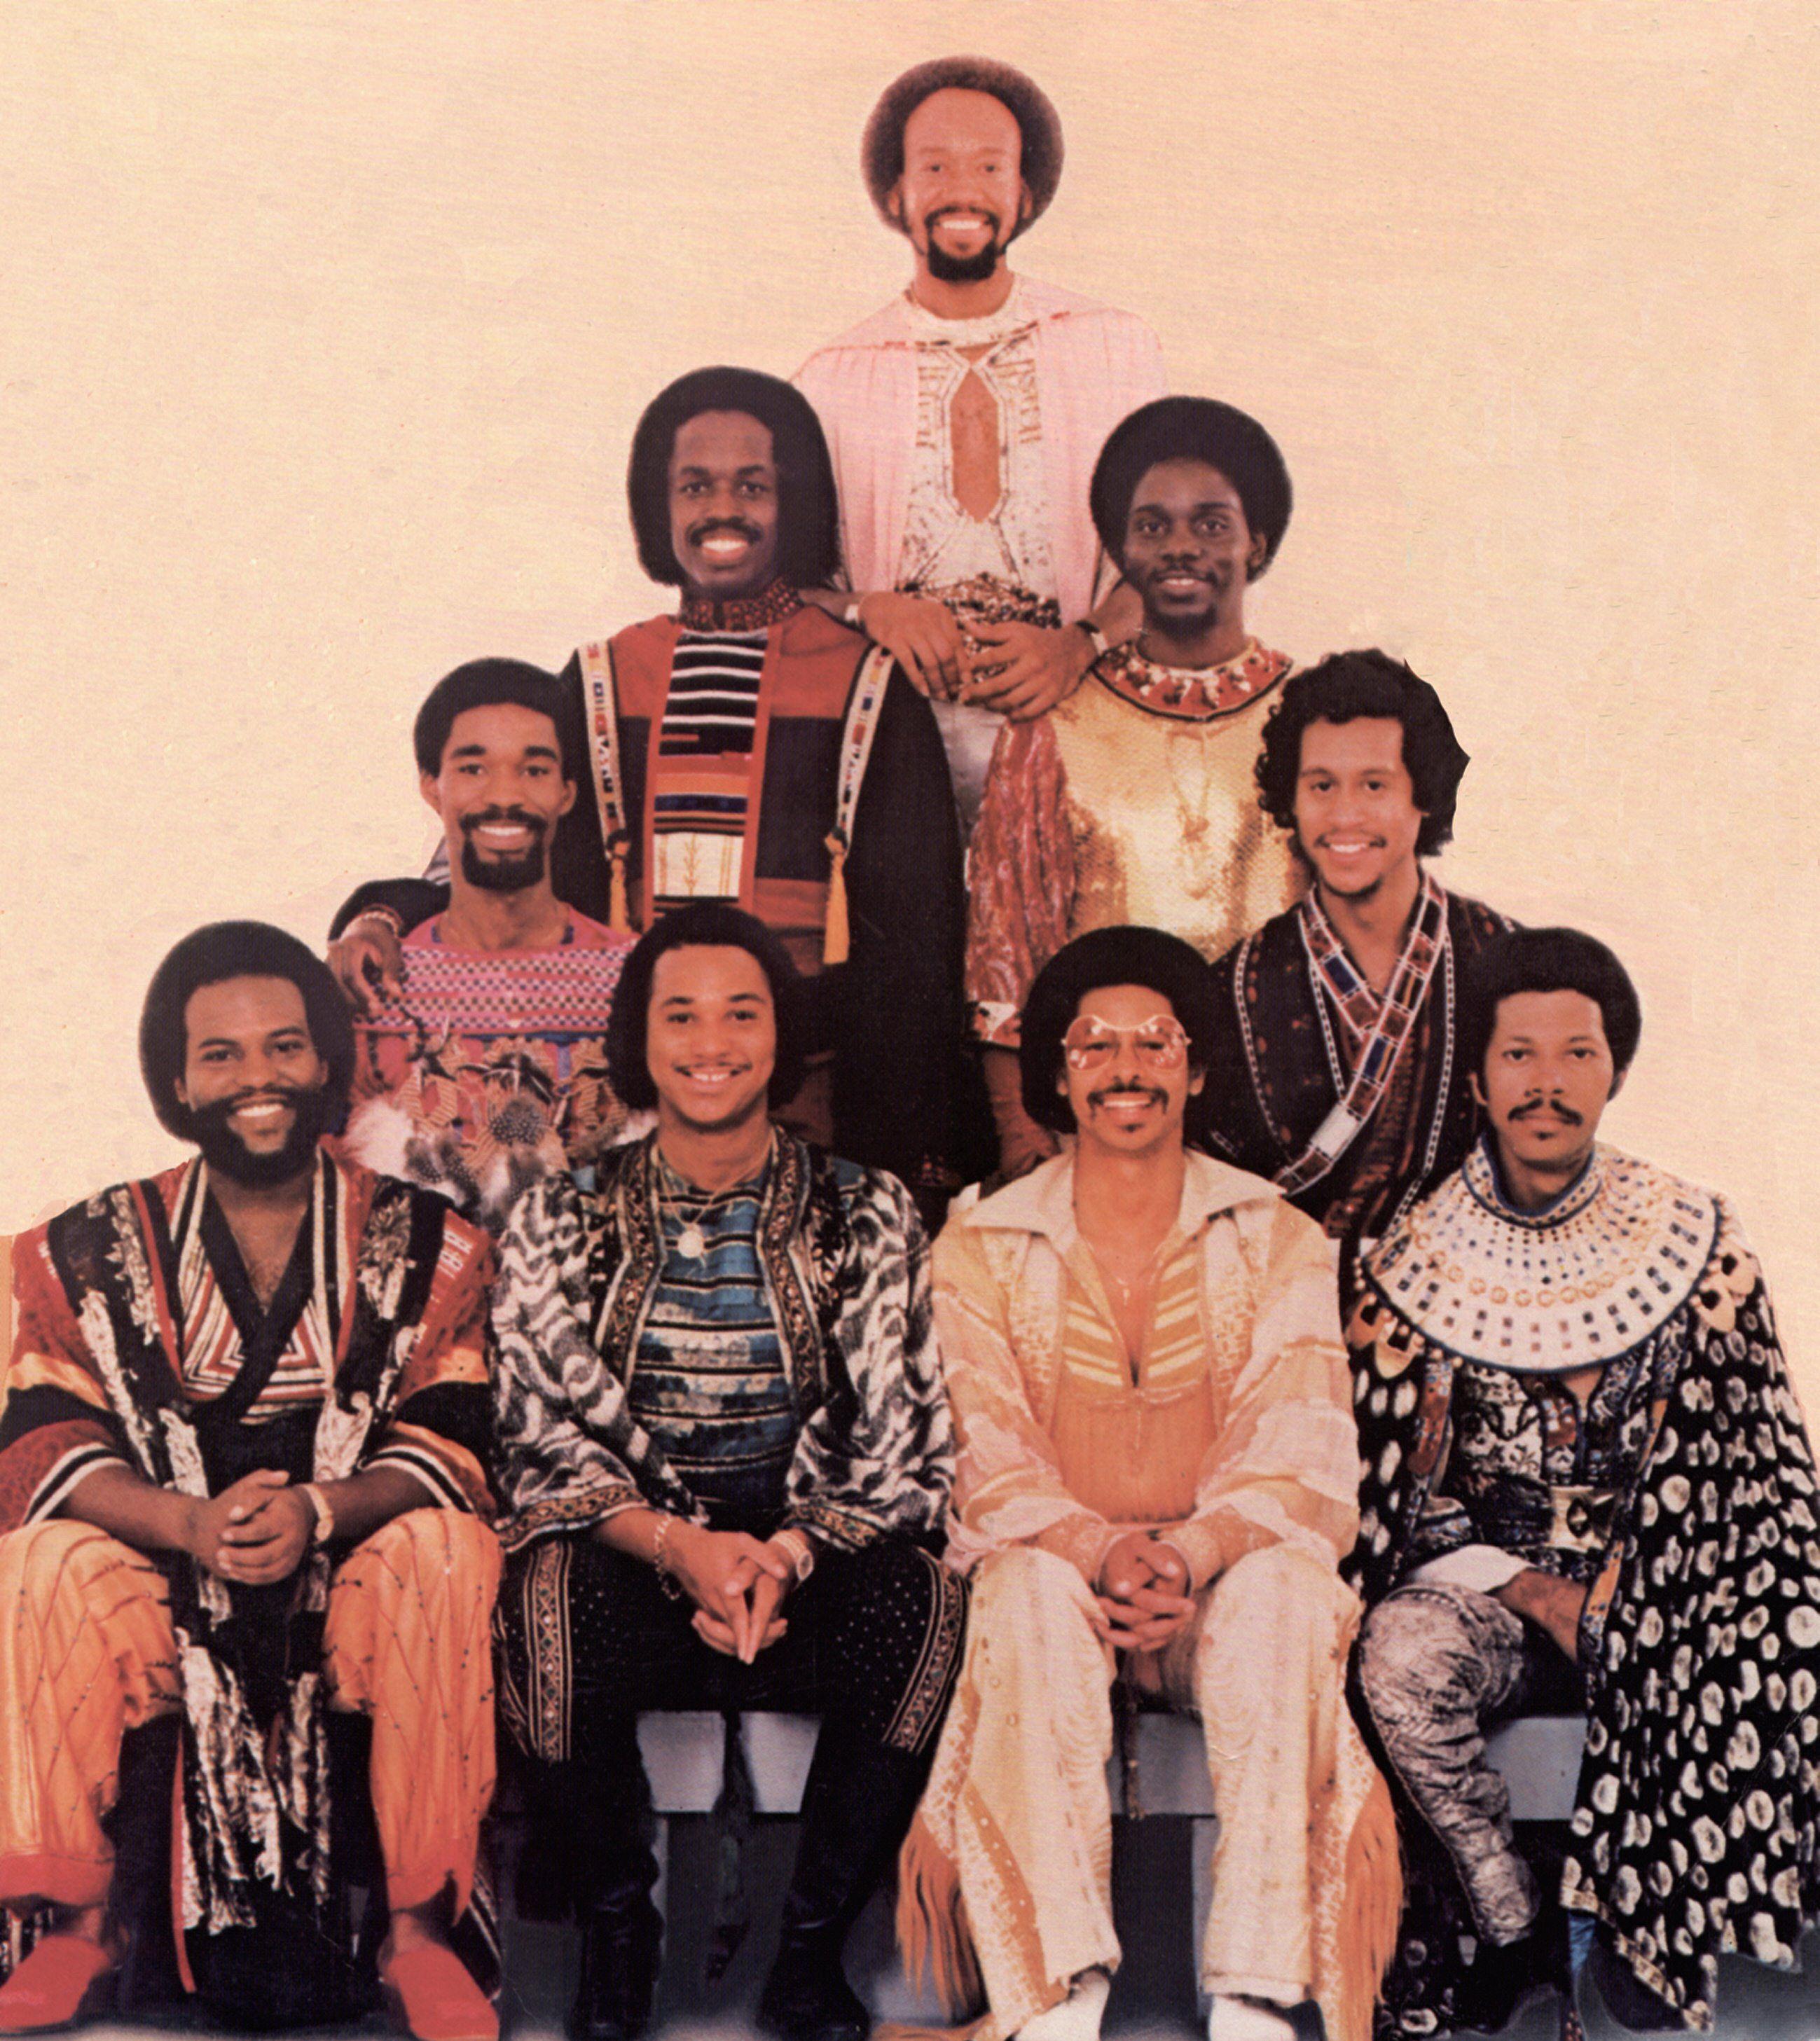 Ten Best R&B Bands in History